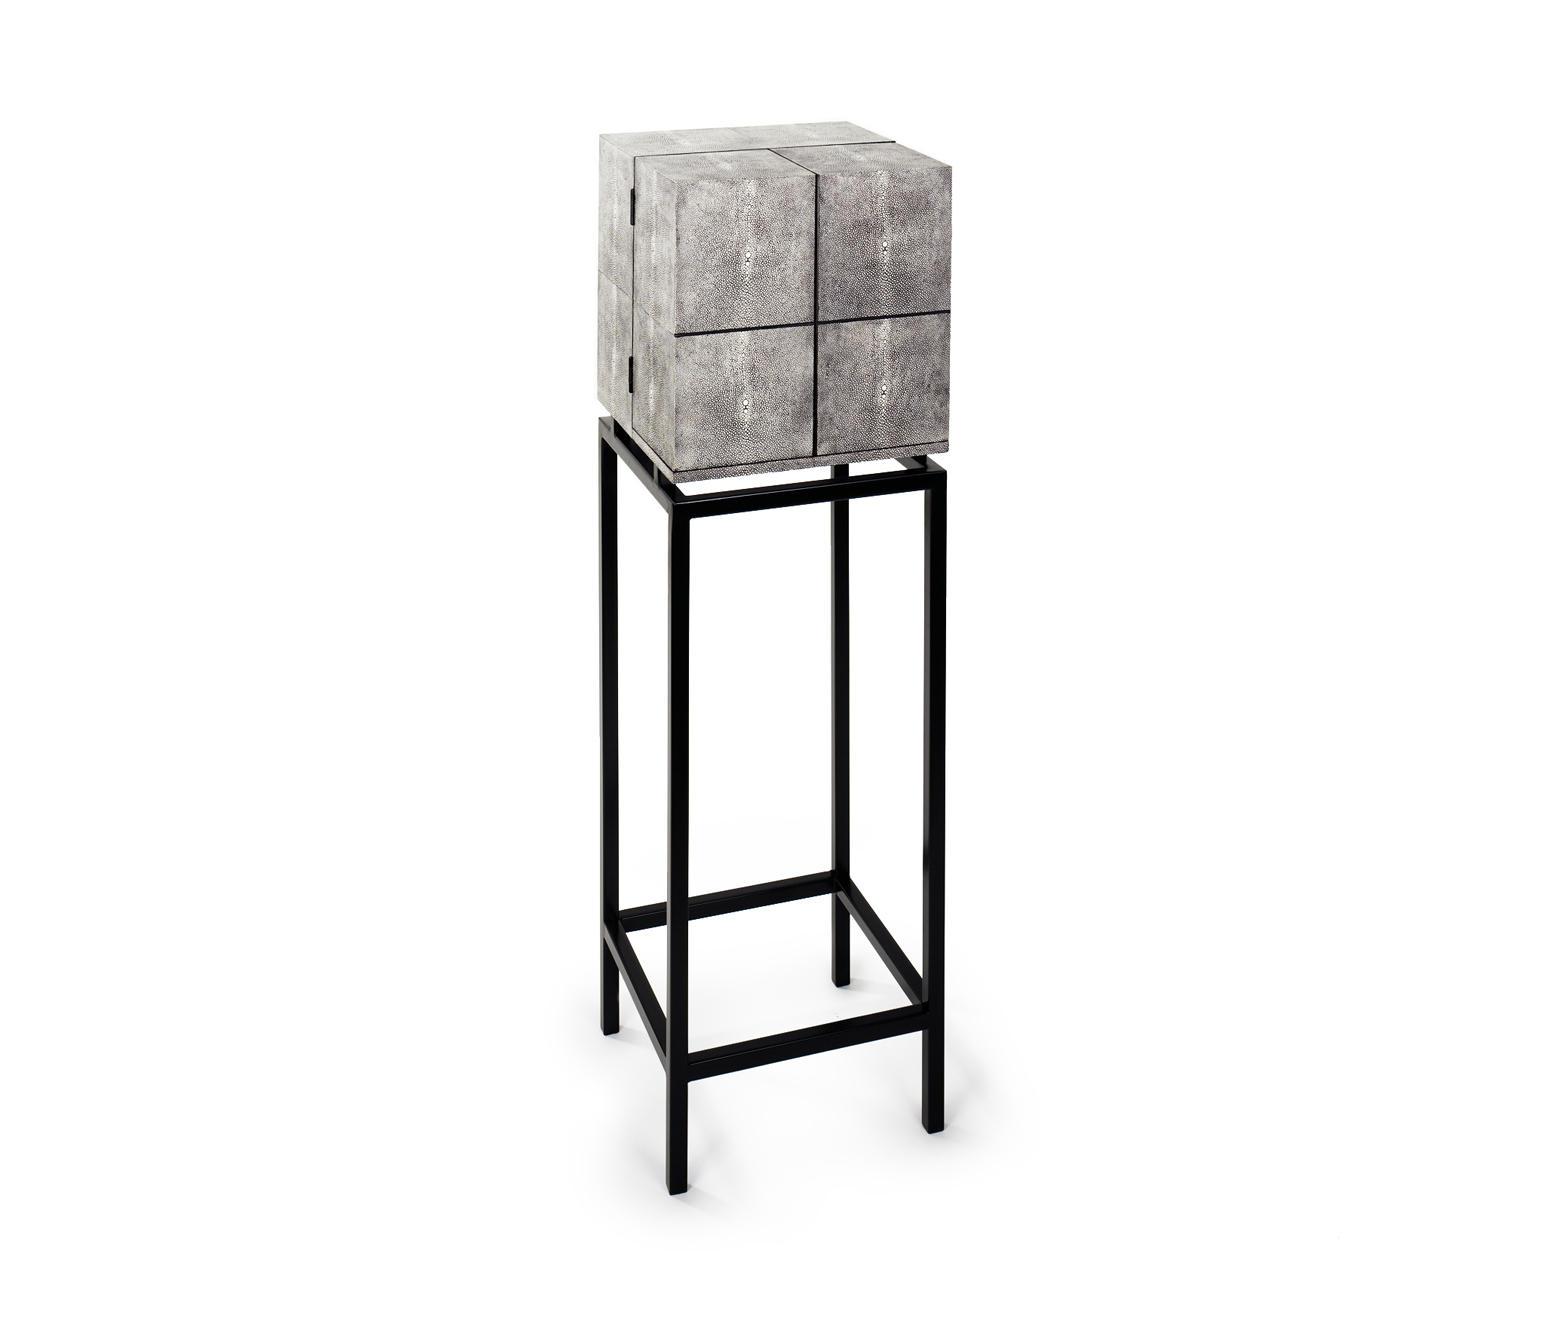 rochen treasure schatzk stchen barschr nke hausbars. Black Bedroom Furniture Sets. Home Design Ideas